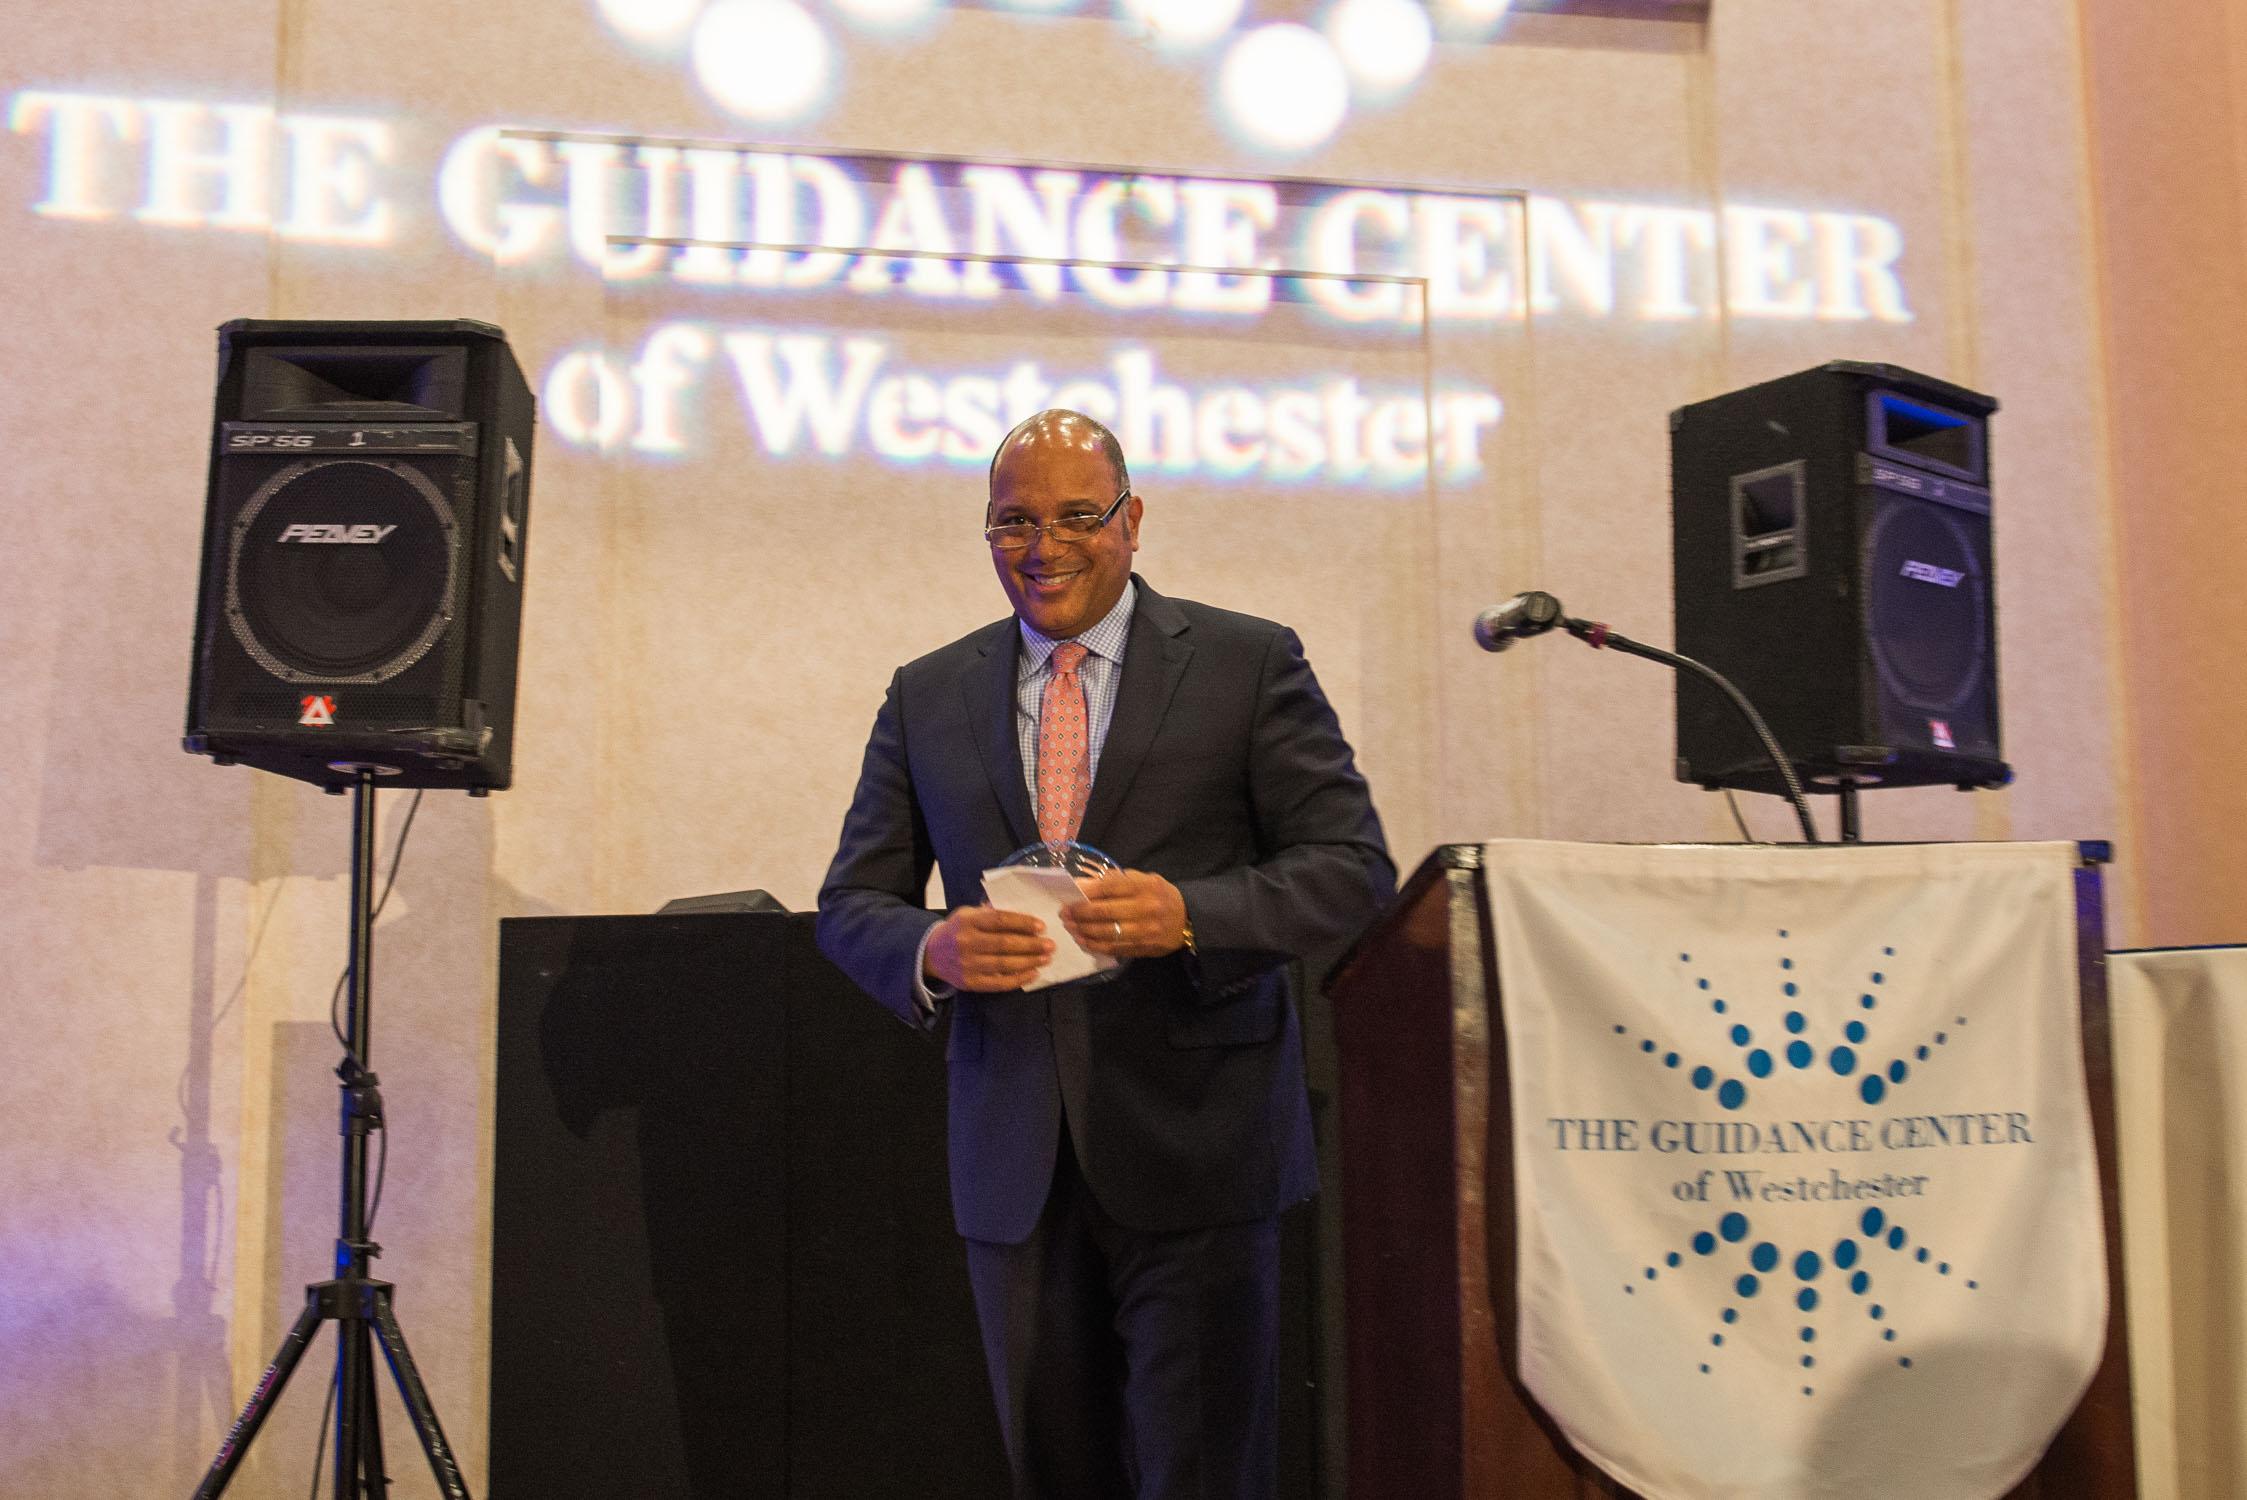 Guidance center gala 2016-3060.jpg